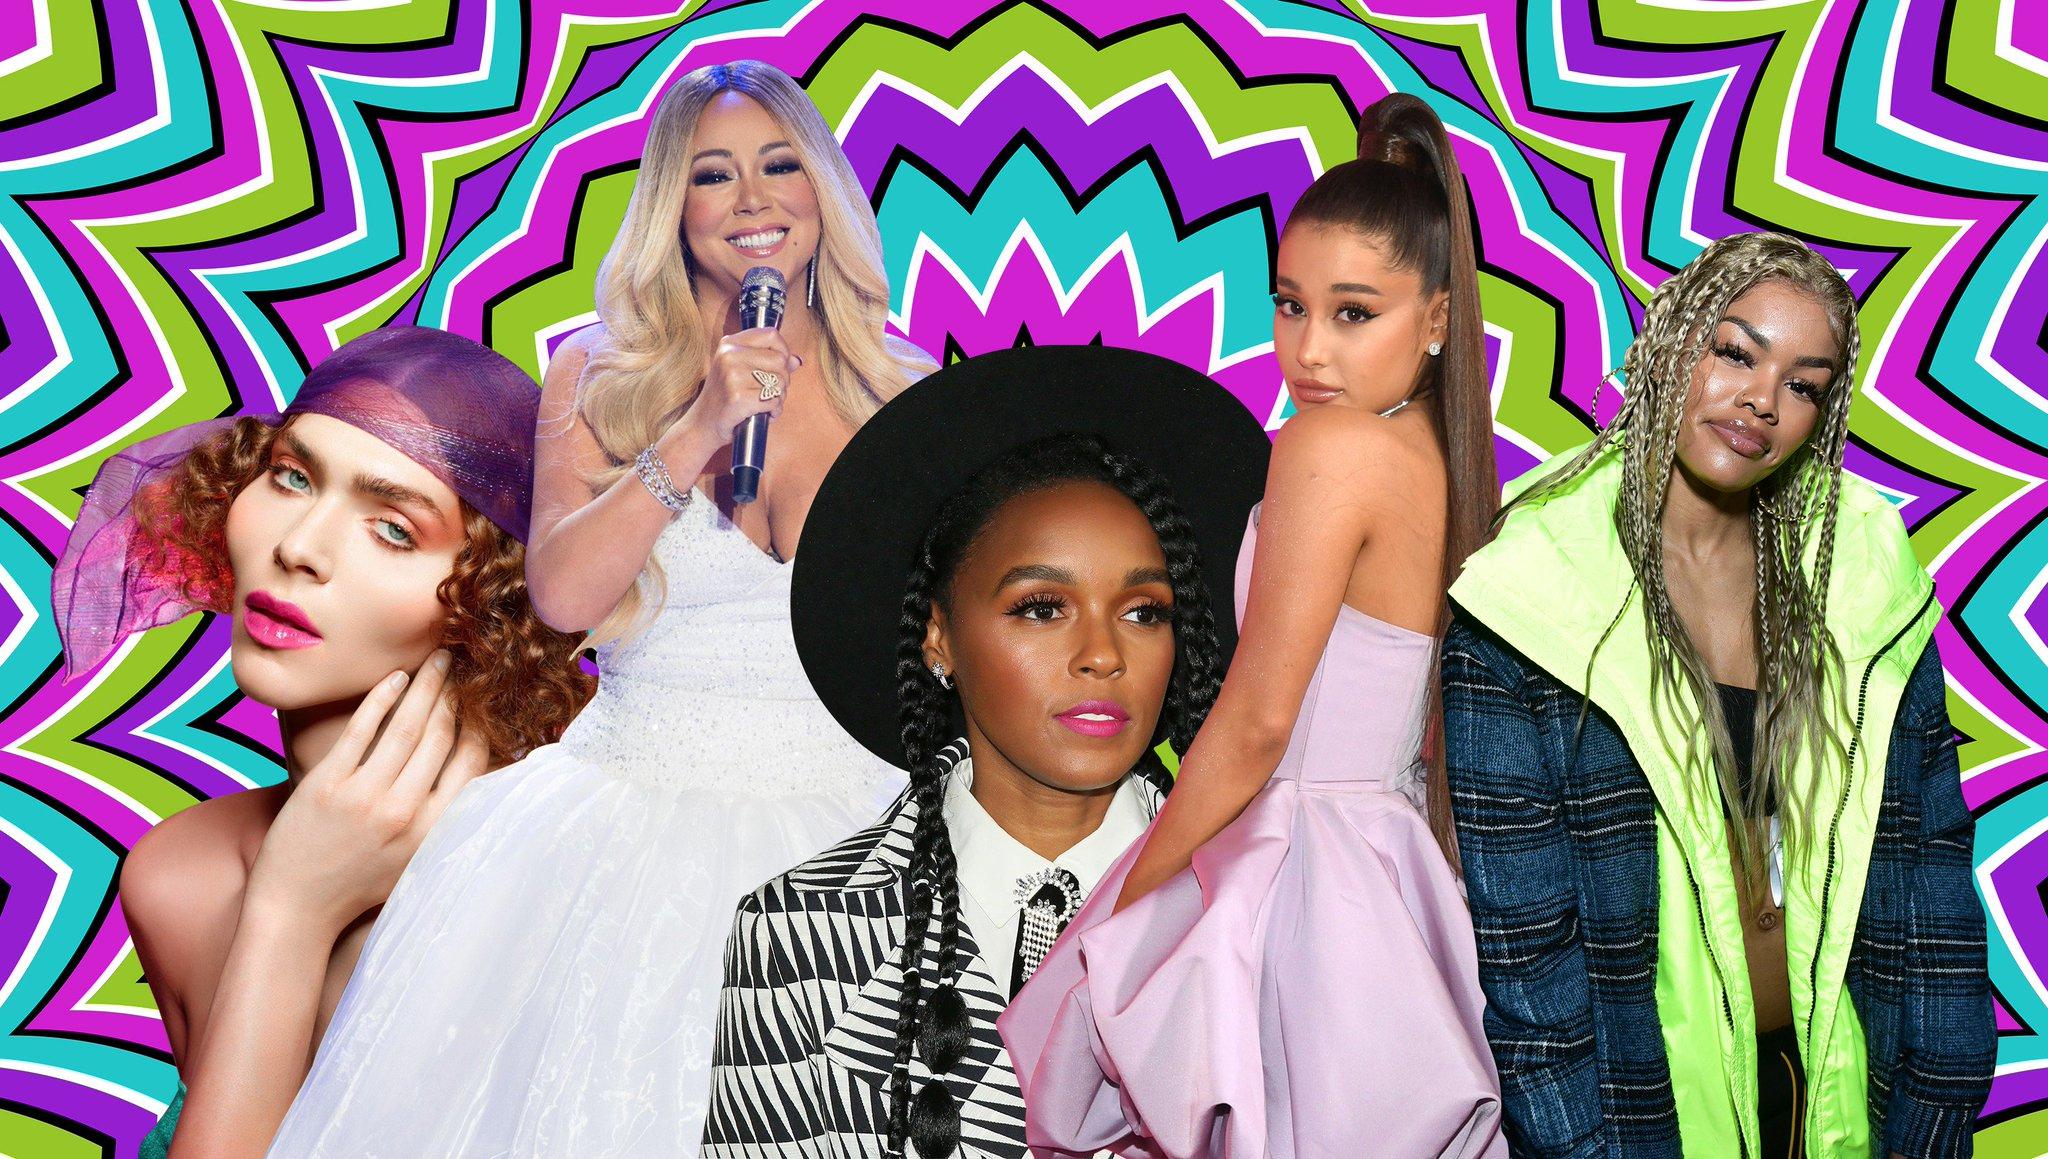 PAPER's Top 20 Albums of 2018 https://t.co/Icv98NZMU8 https://t.co/STpiFKymLK